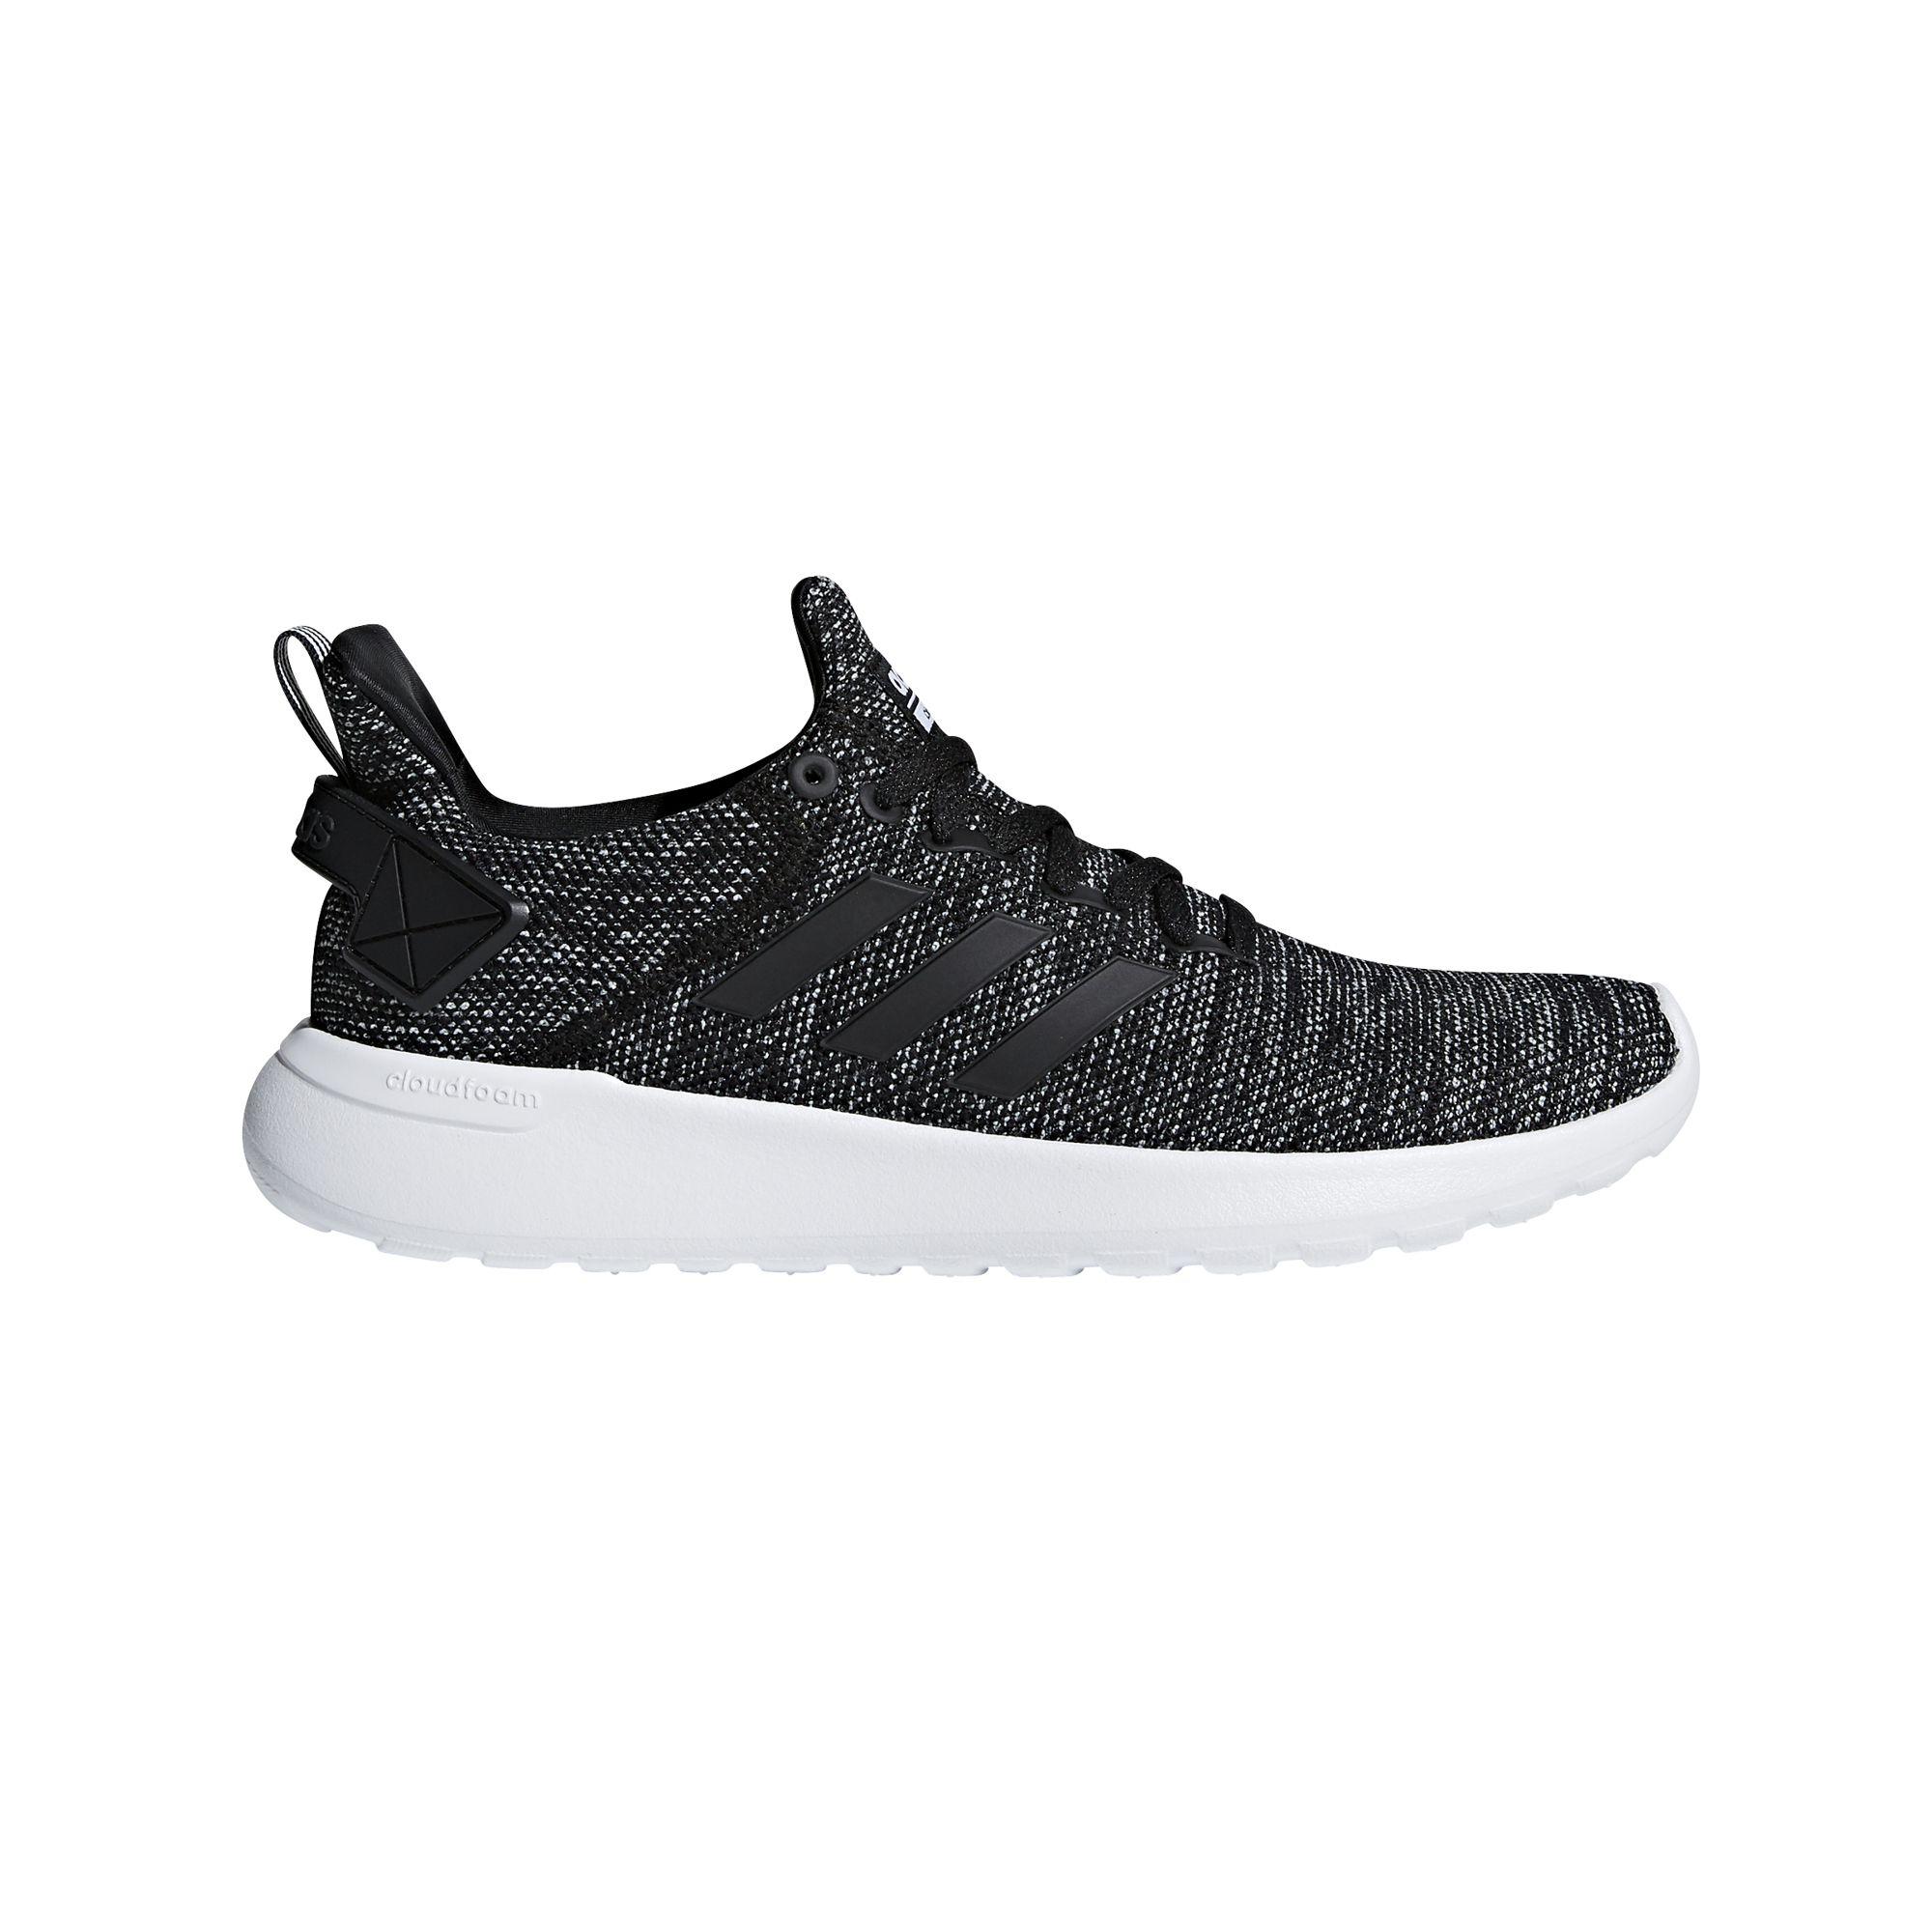 Férfi - Cipő - Sportcipő Adidas Originals a83fc2fca5